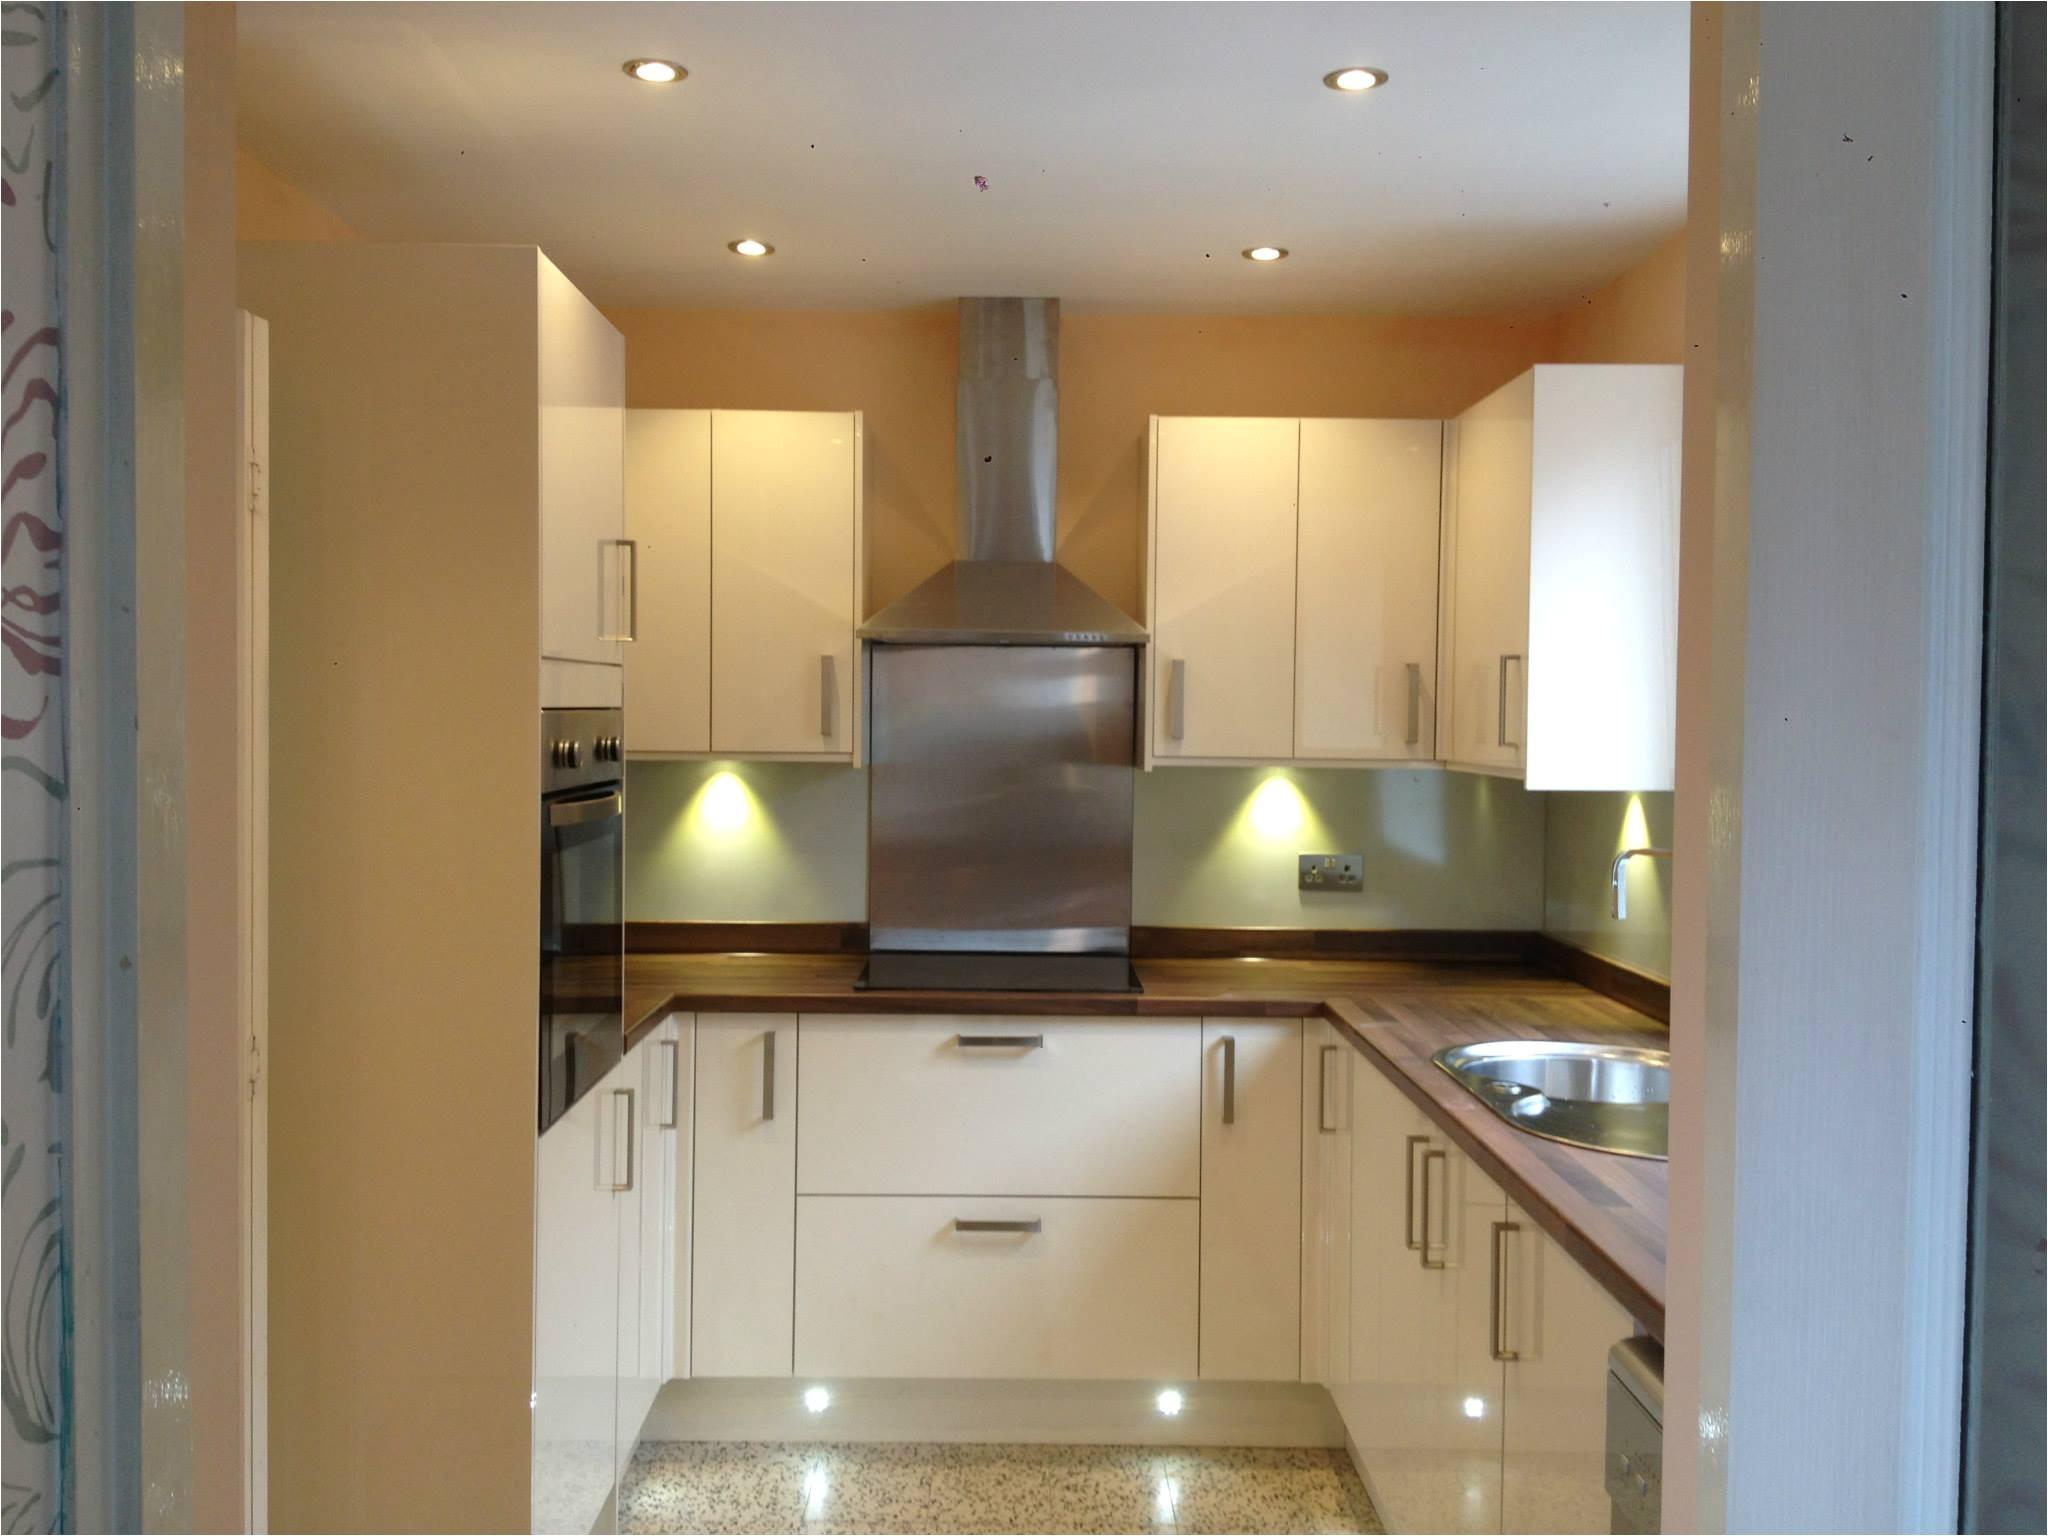 Kitchen Ceiling Design 2016 Elegant Extraordinary New Kitchen 28 Cabinets Fresh Cabinet 0d Bright Lights